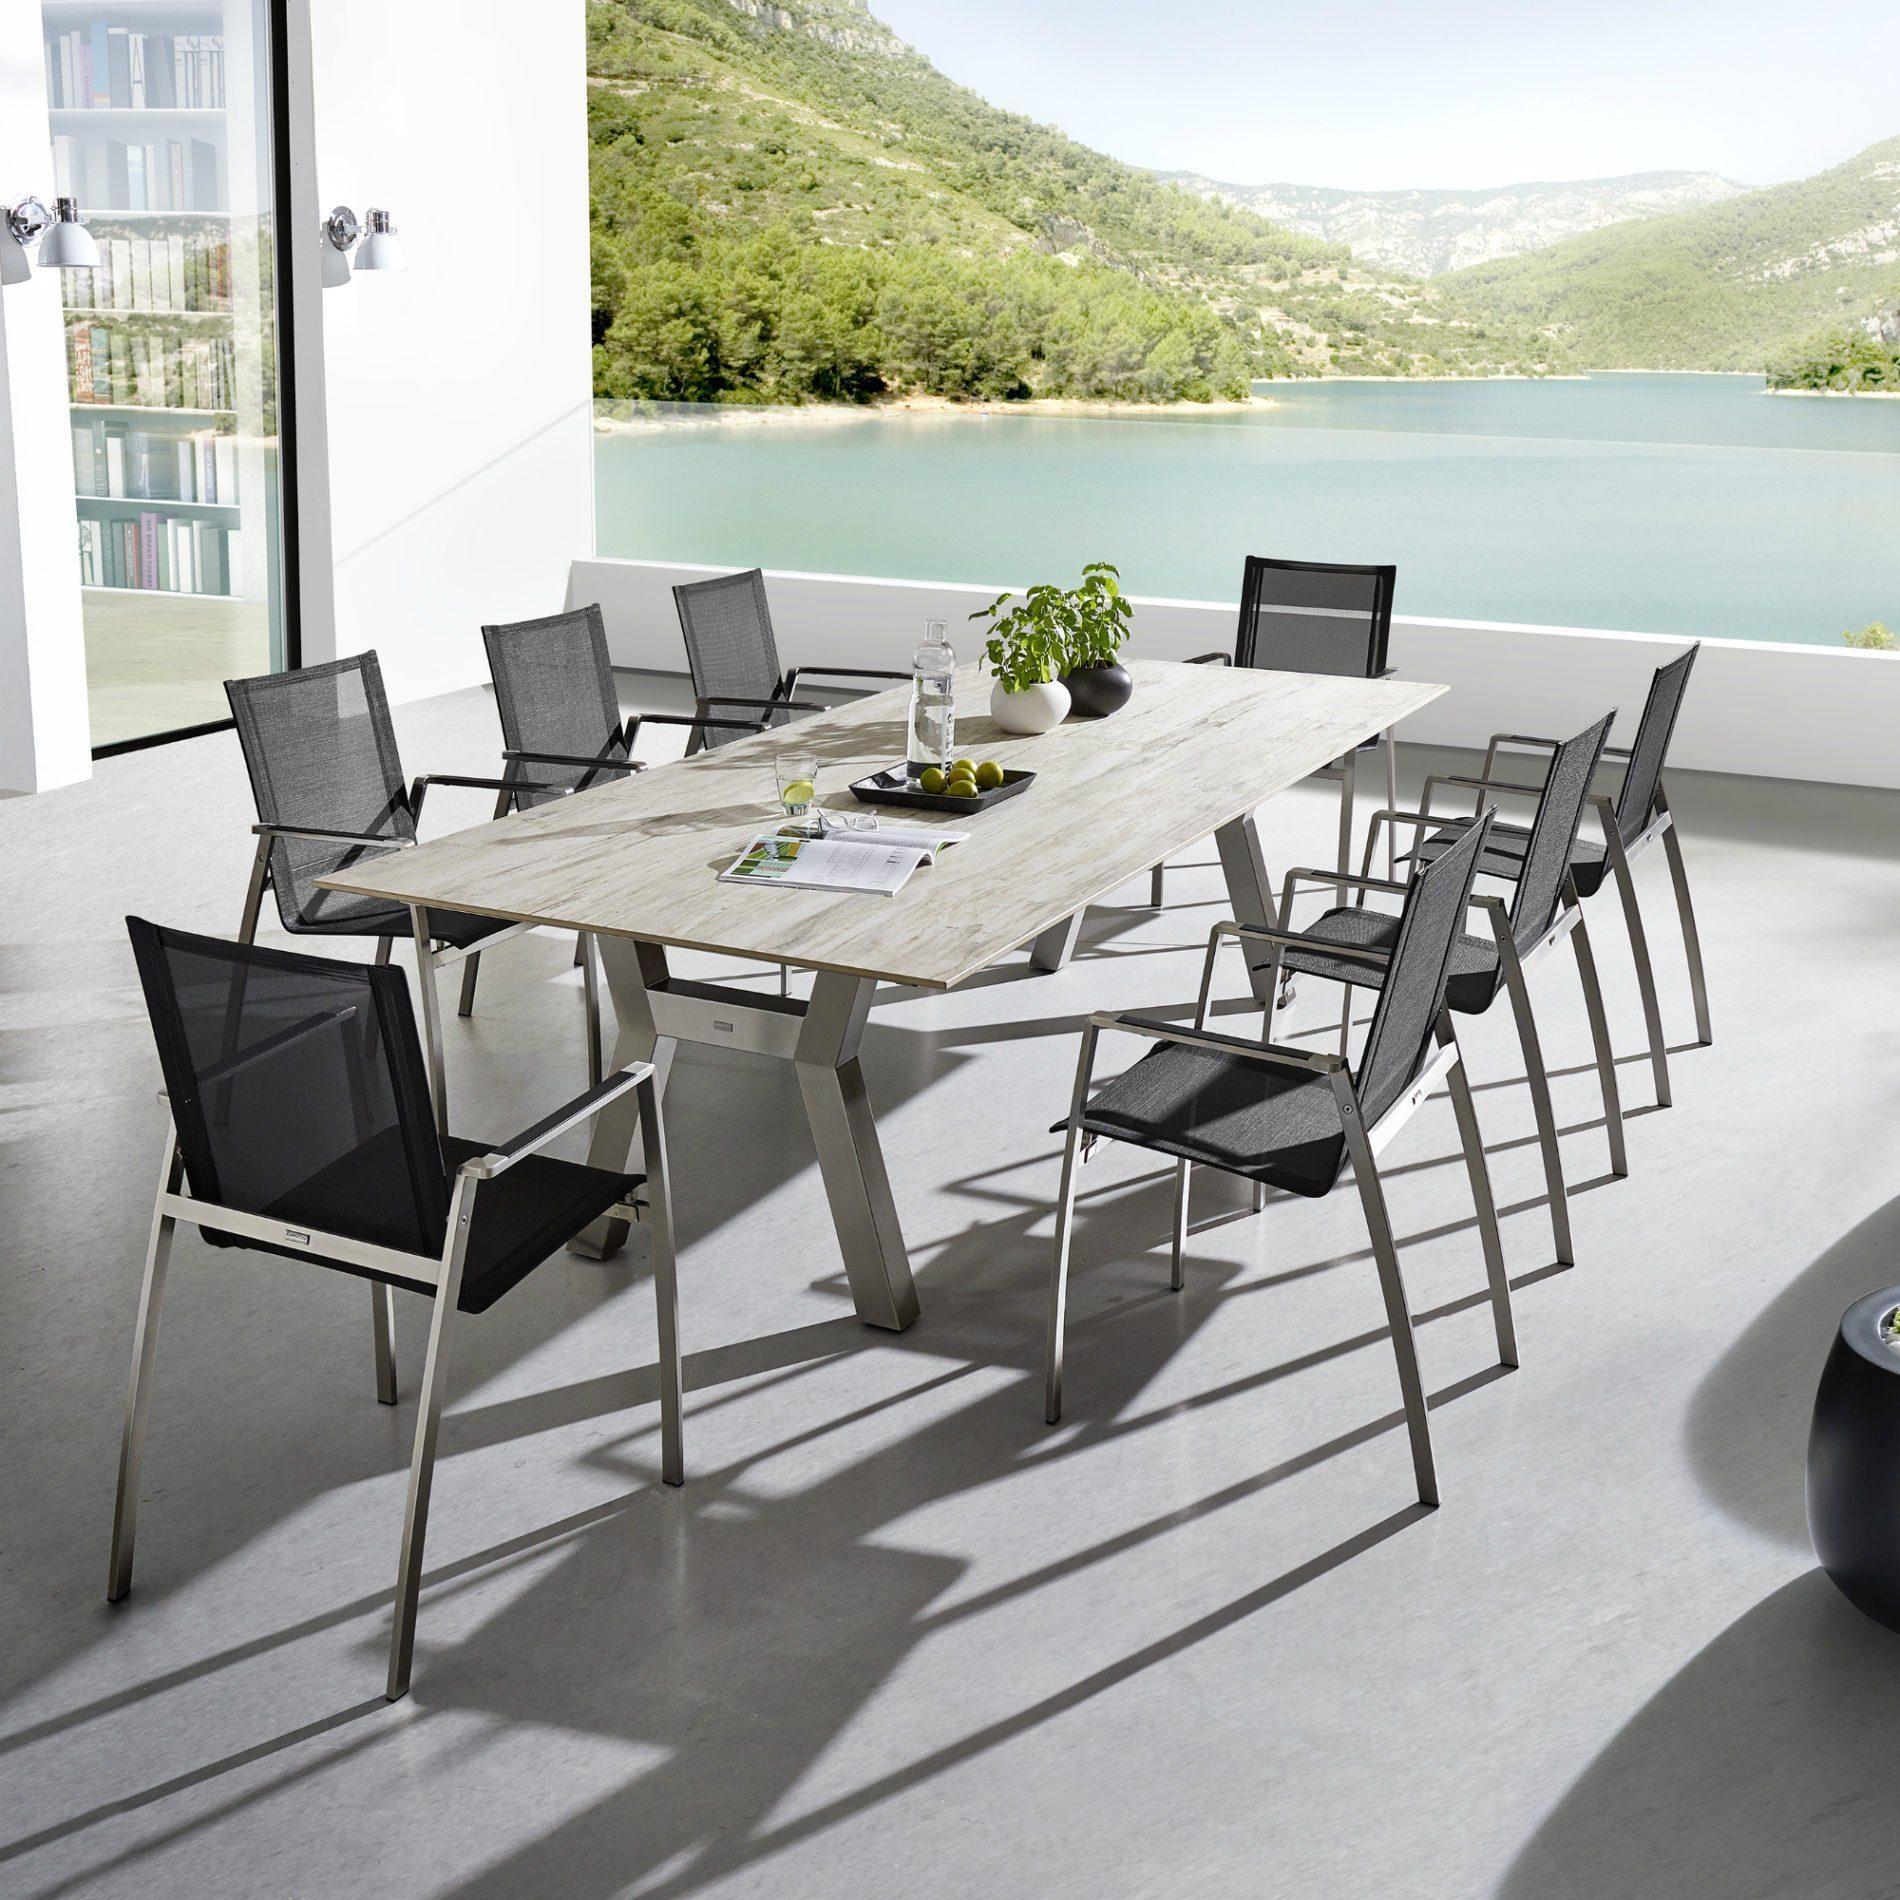 zumsteg gigante gartentisch edelstahl keramik. Black Bedroom Furniture Sets. Home Design Ideas